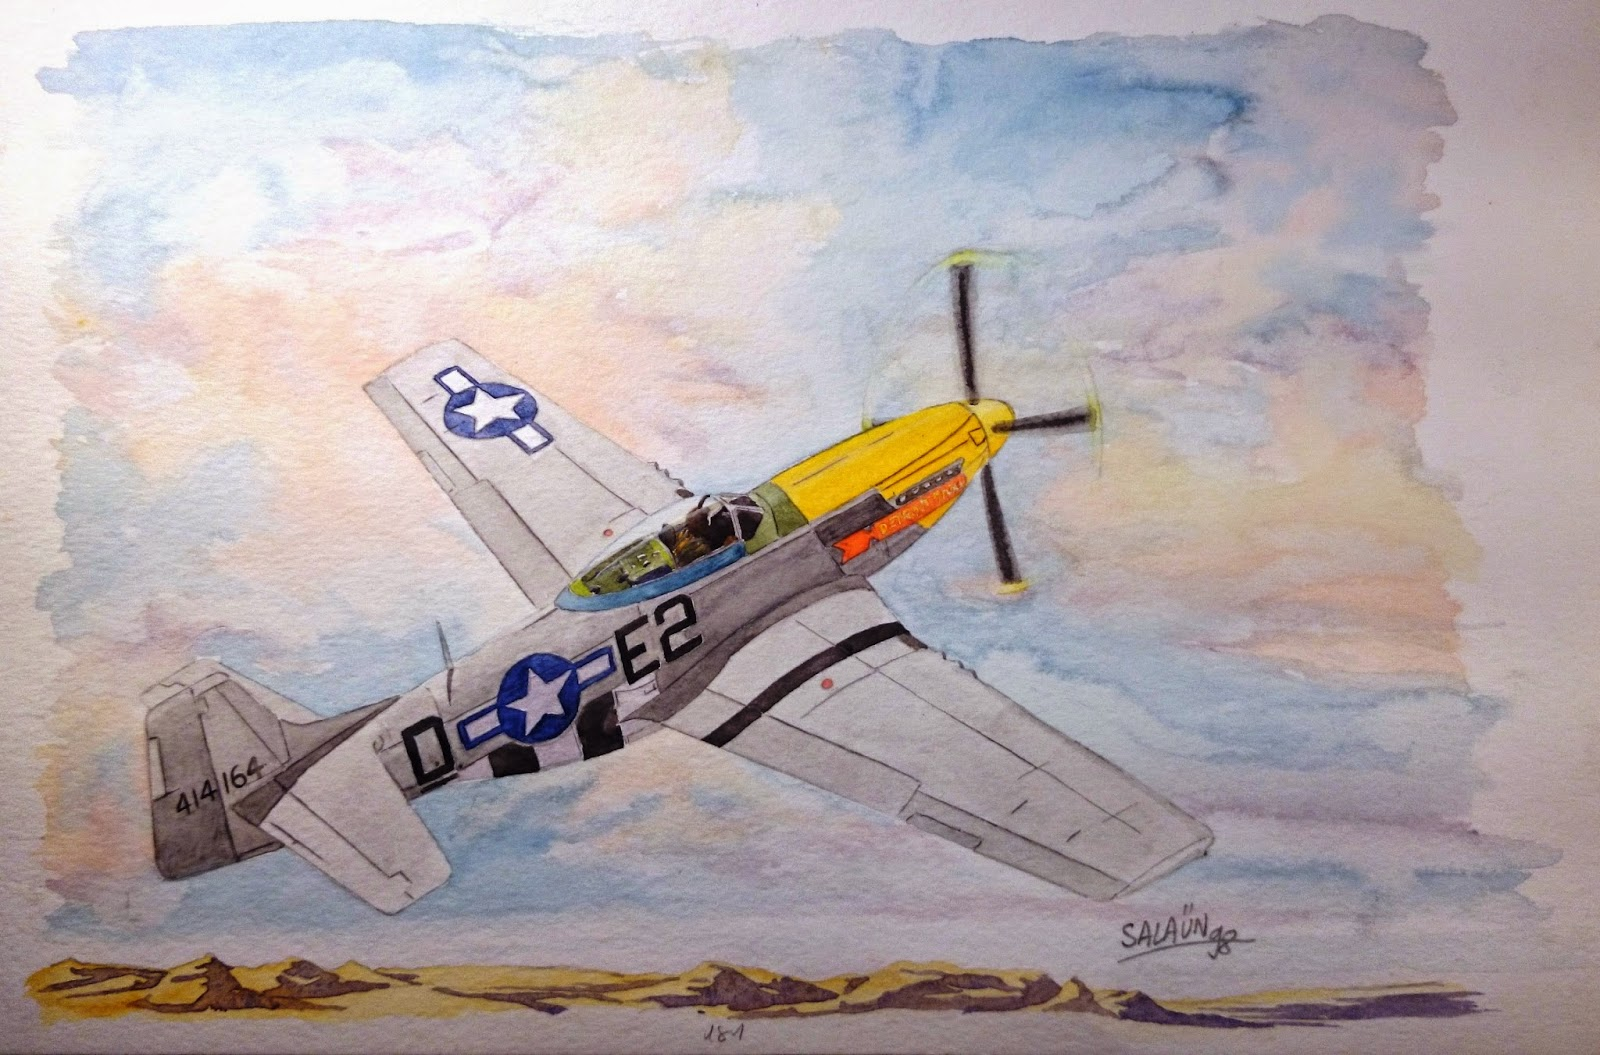 North American P-51D-10-NA 'MUSTANG', aquarelle